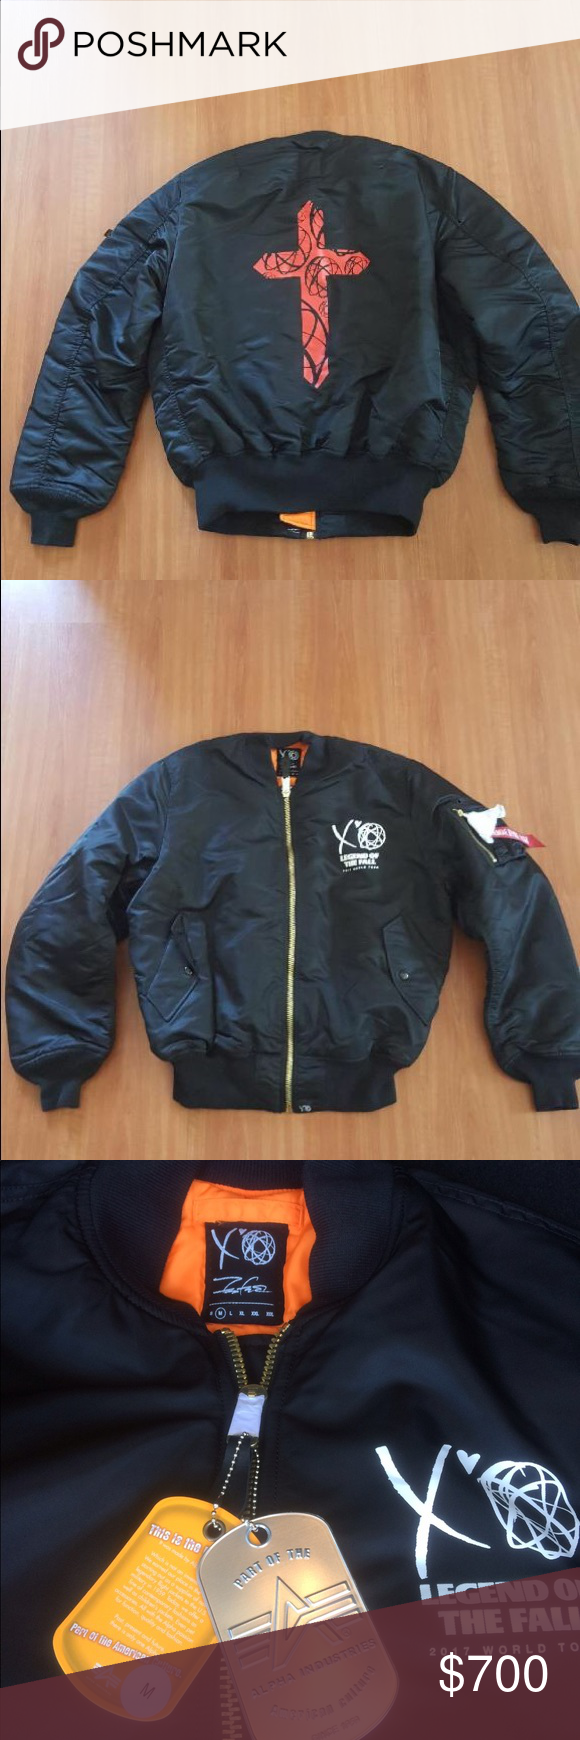 The Weeknd Starboy Futura Bomber Jacket Jackets Bomber Jacket Clothes Design [ 1740 x 580 Pixel ]